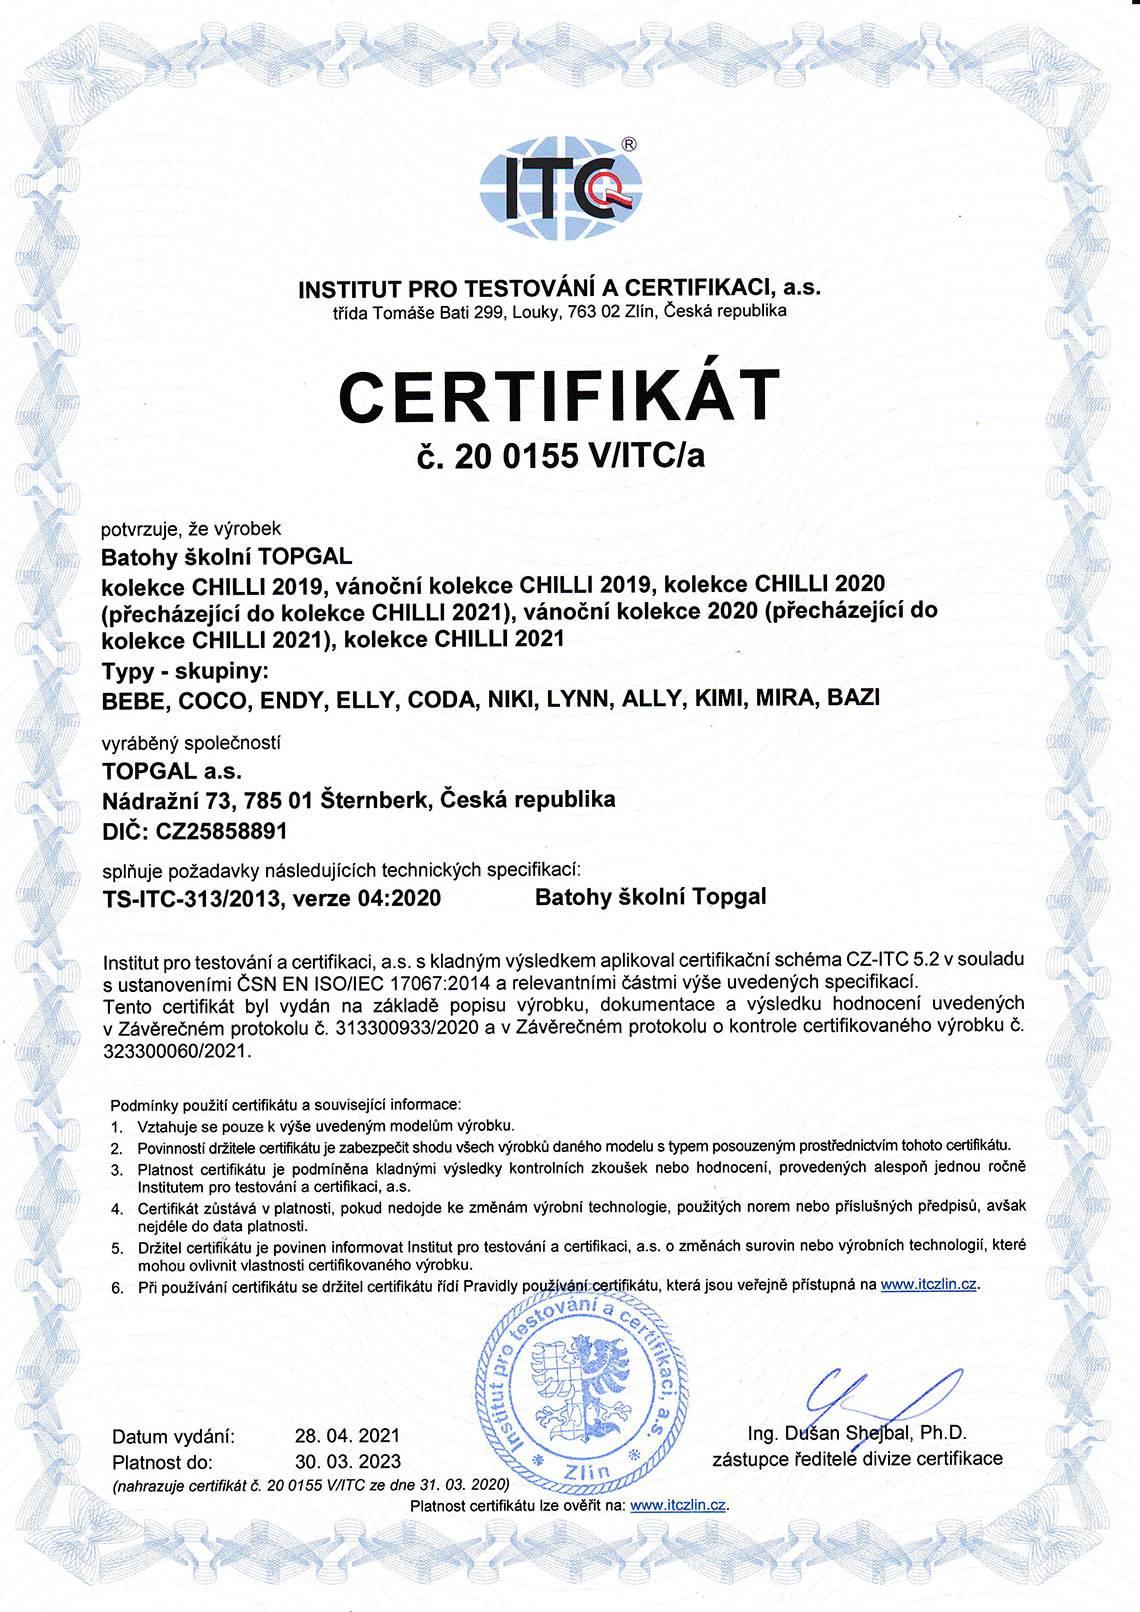 Topgal - ITC Certifikát 2021